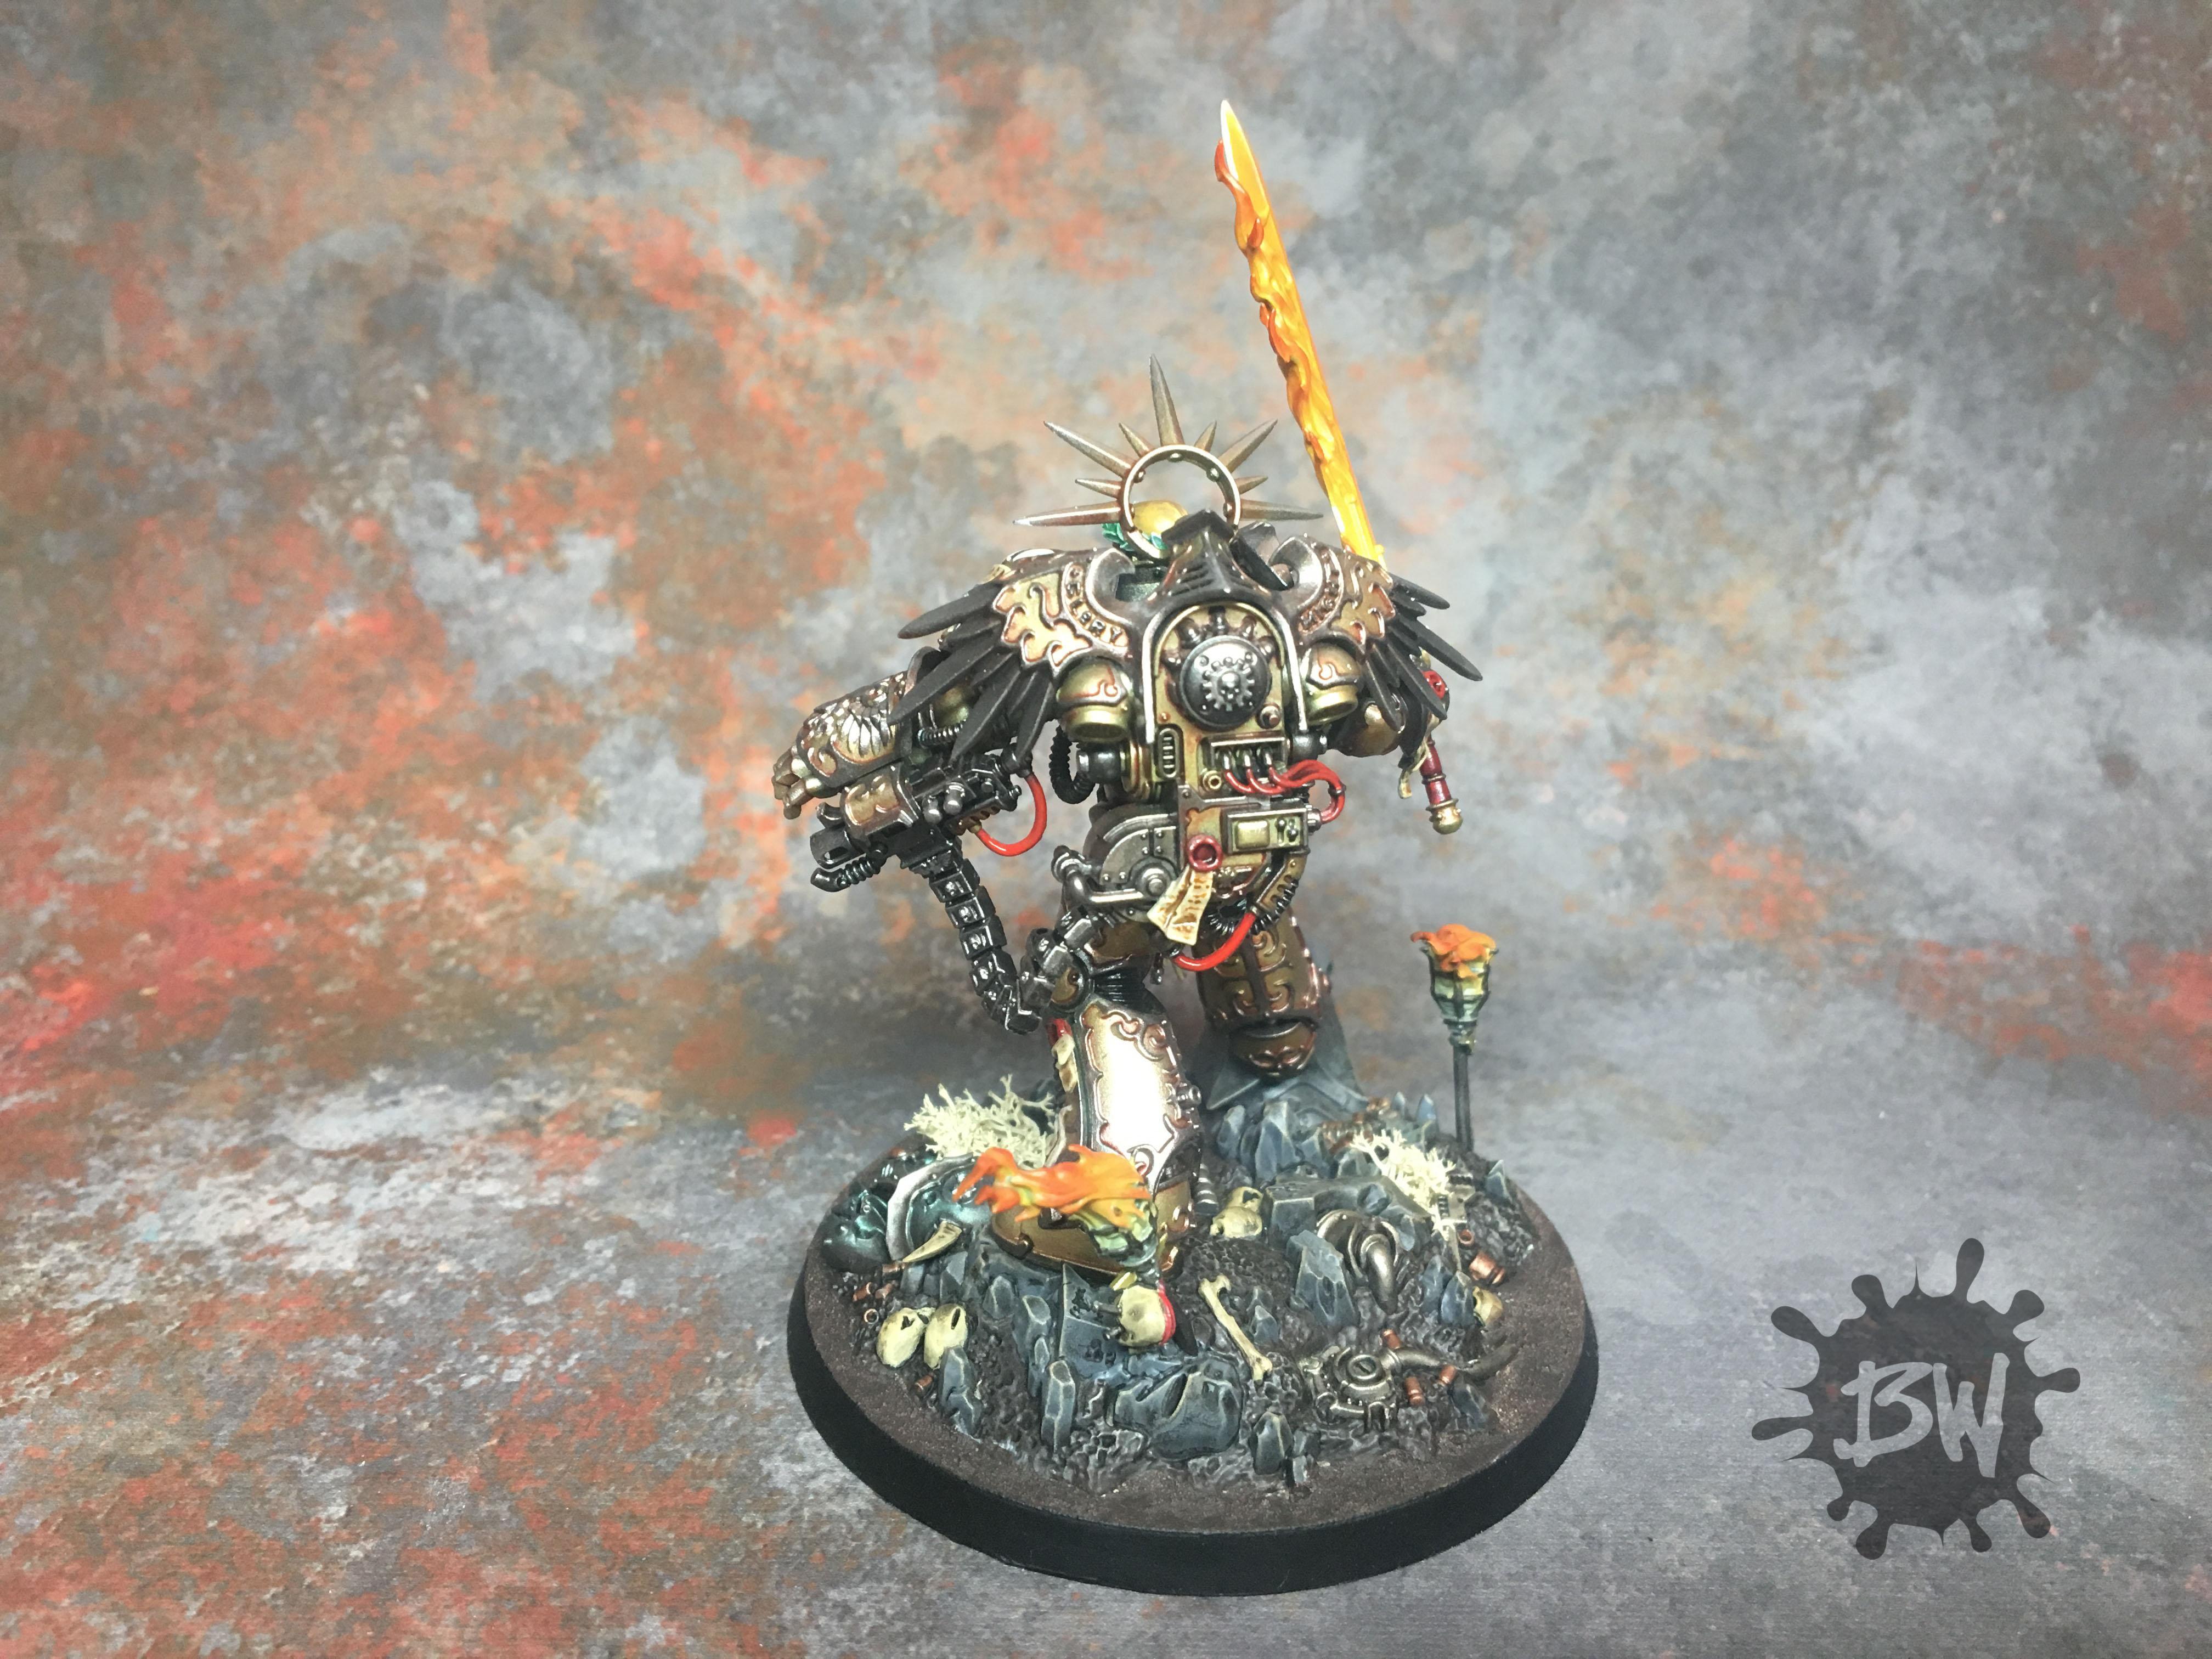 Imperium, Primaris, Roboute Guilliman, Ultramarines, Warhammer 40,000